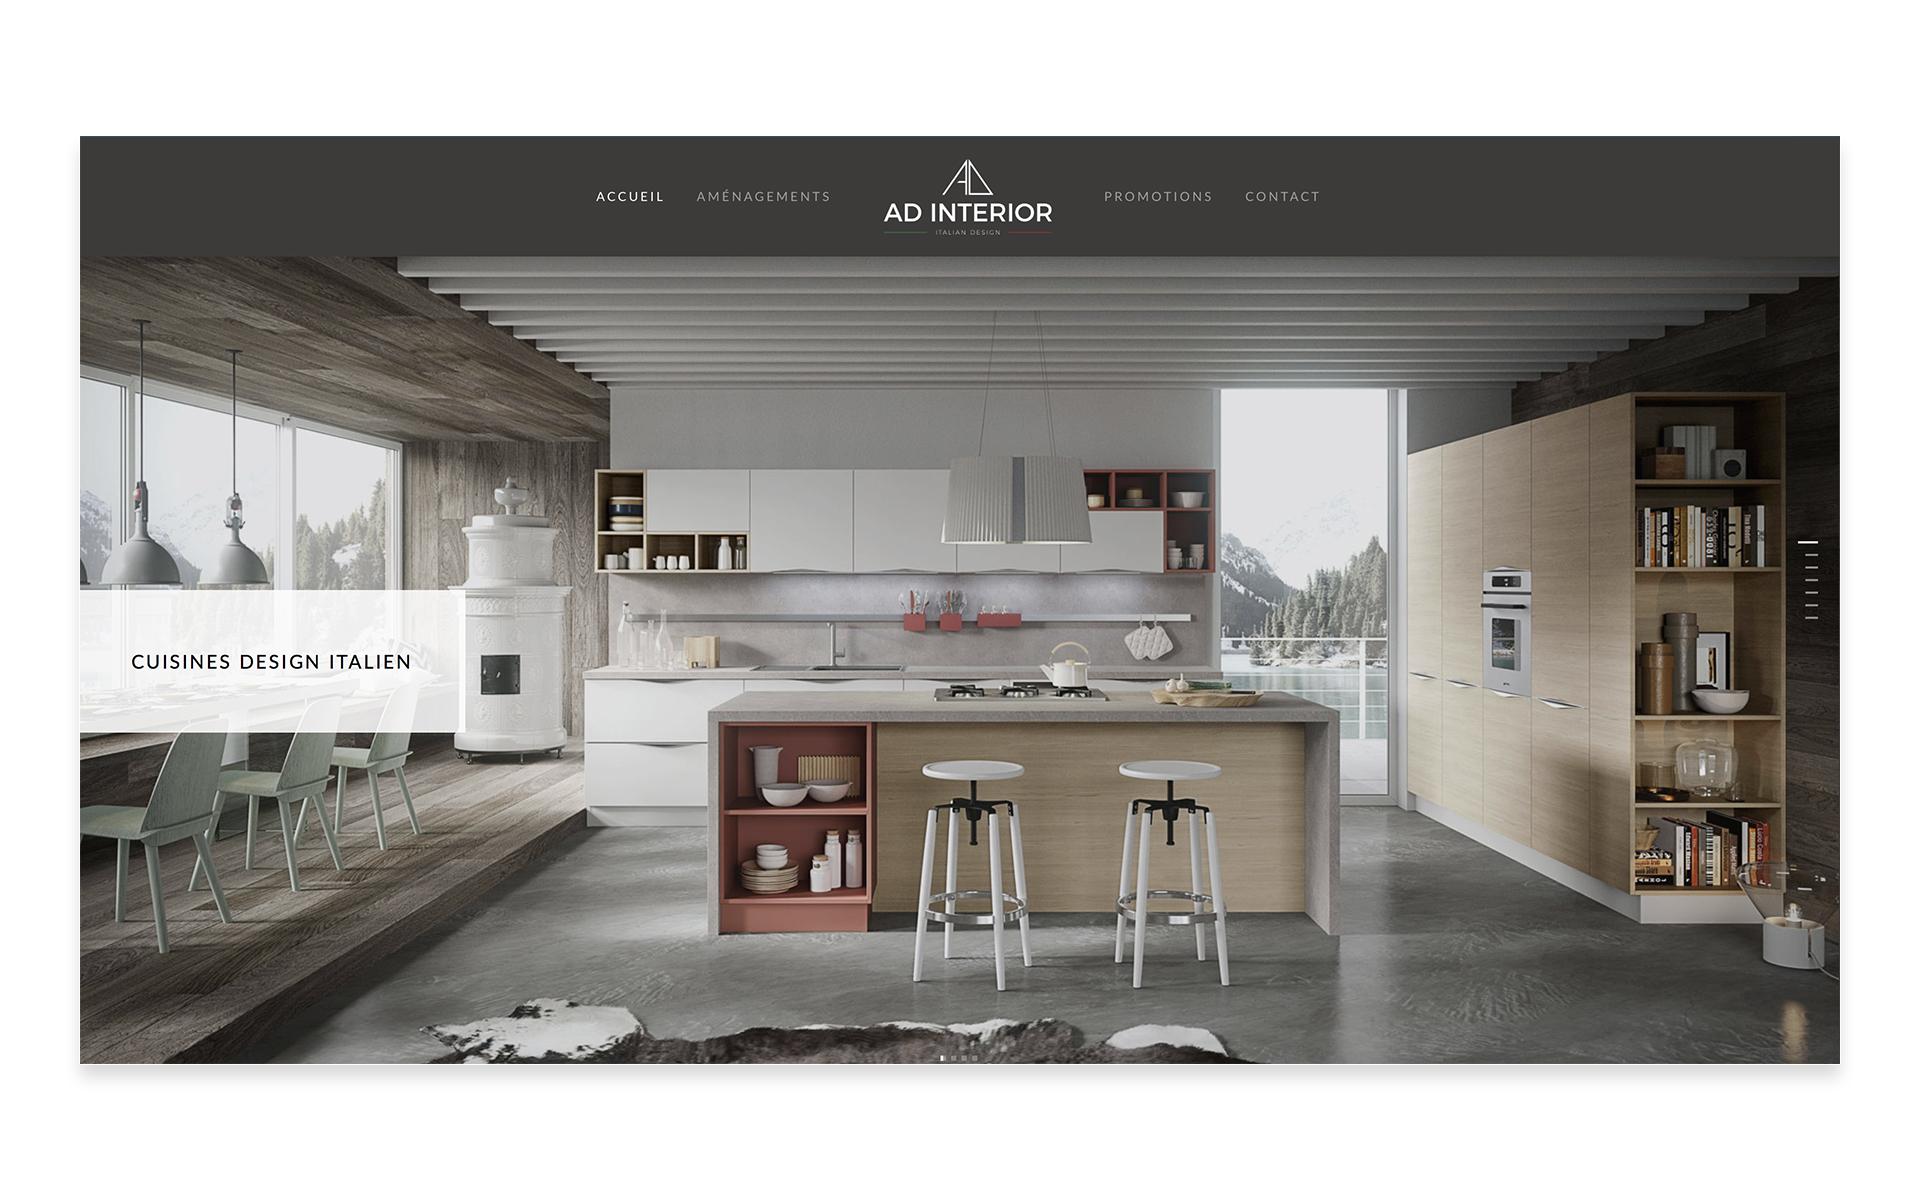 mood-d project ad interior creative agency 05.jpg